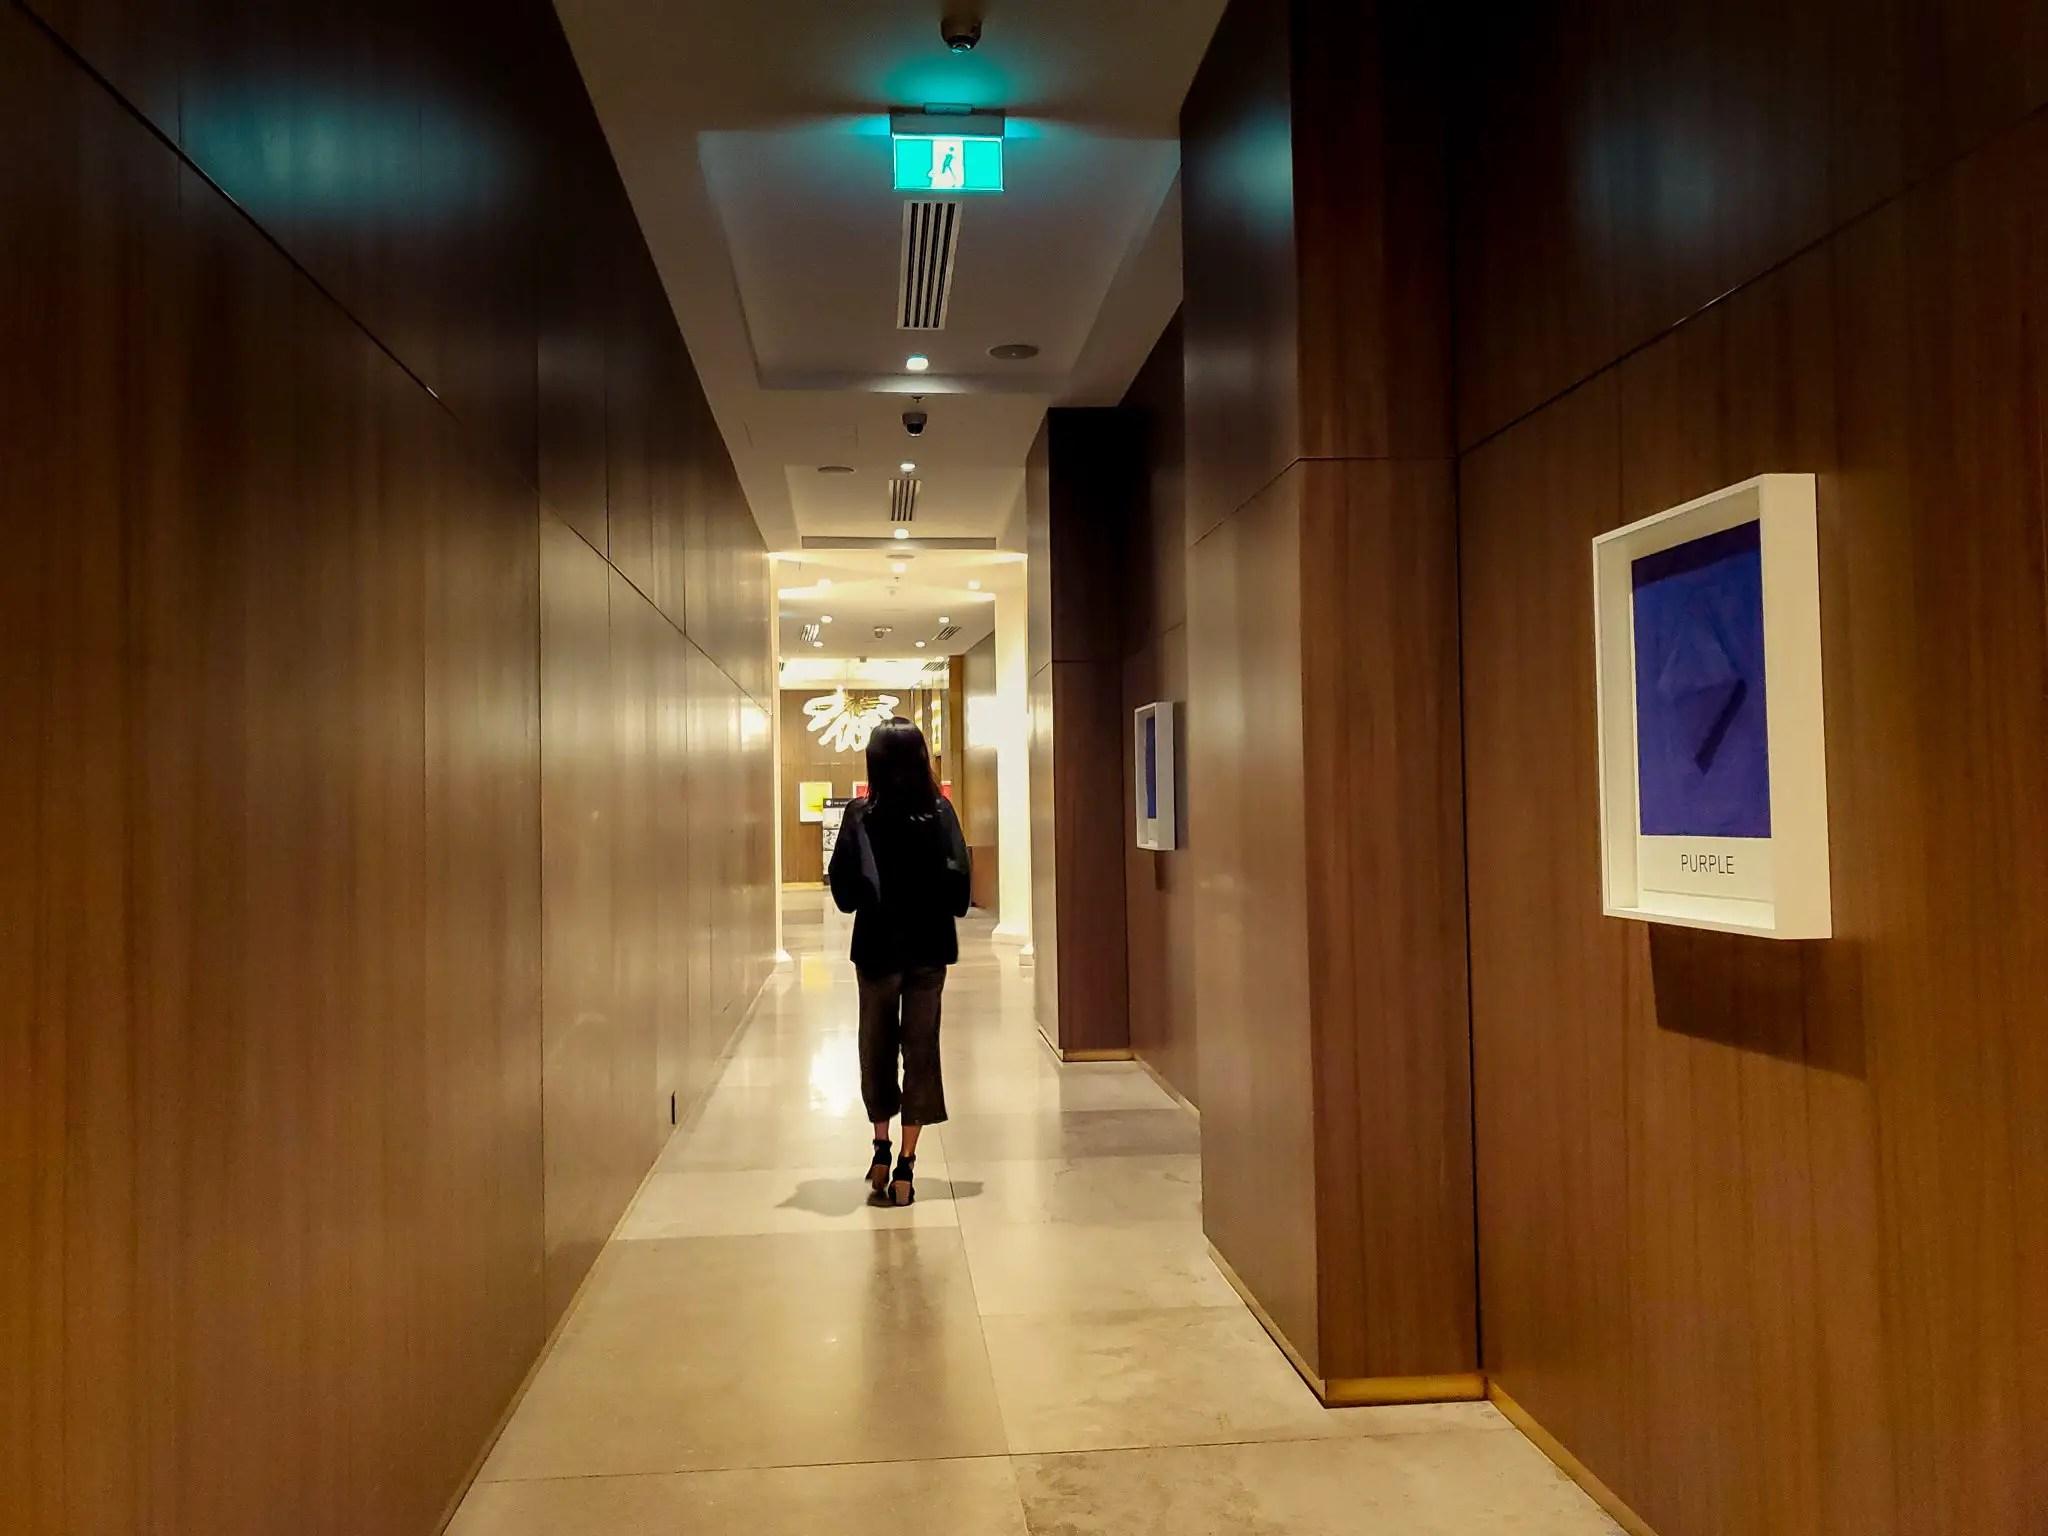 Lobby at JW Marriott Parq